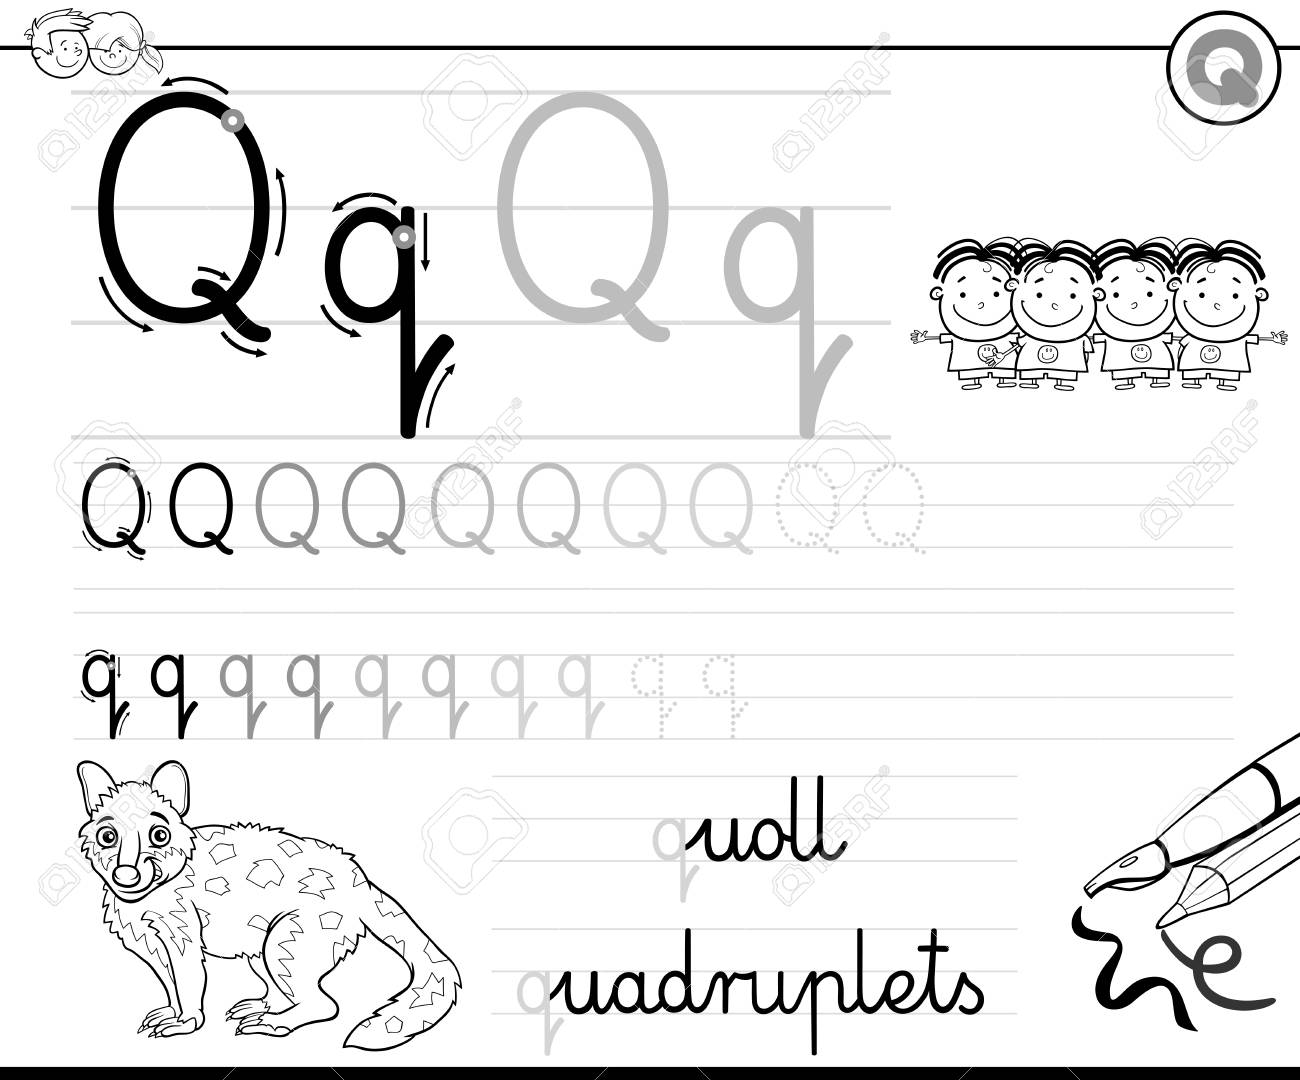 Black And White Cartoon Illustration Of Writing Skills Practice